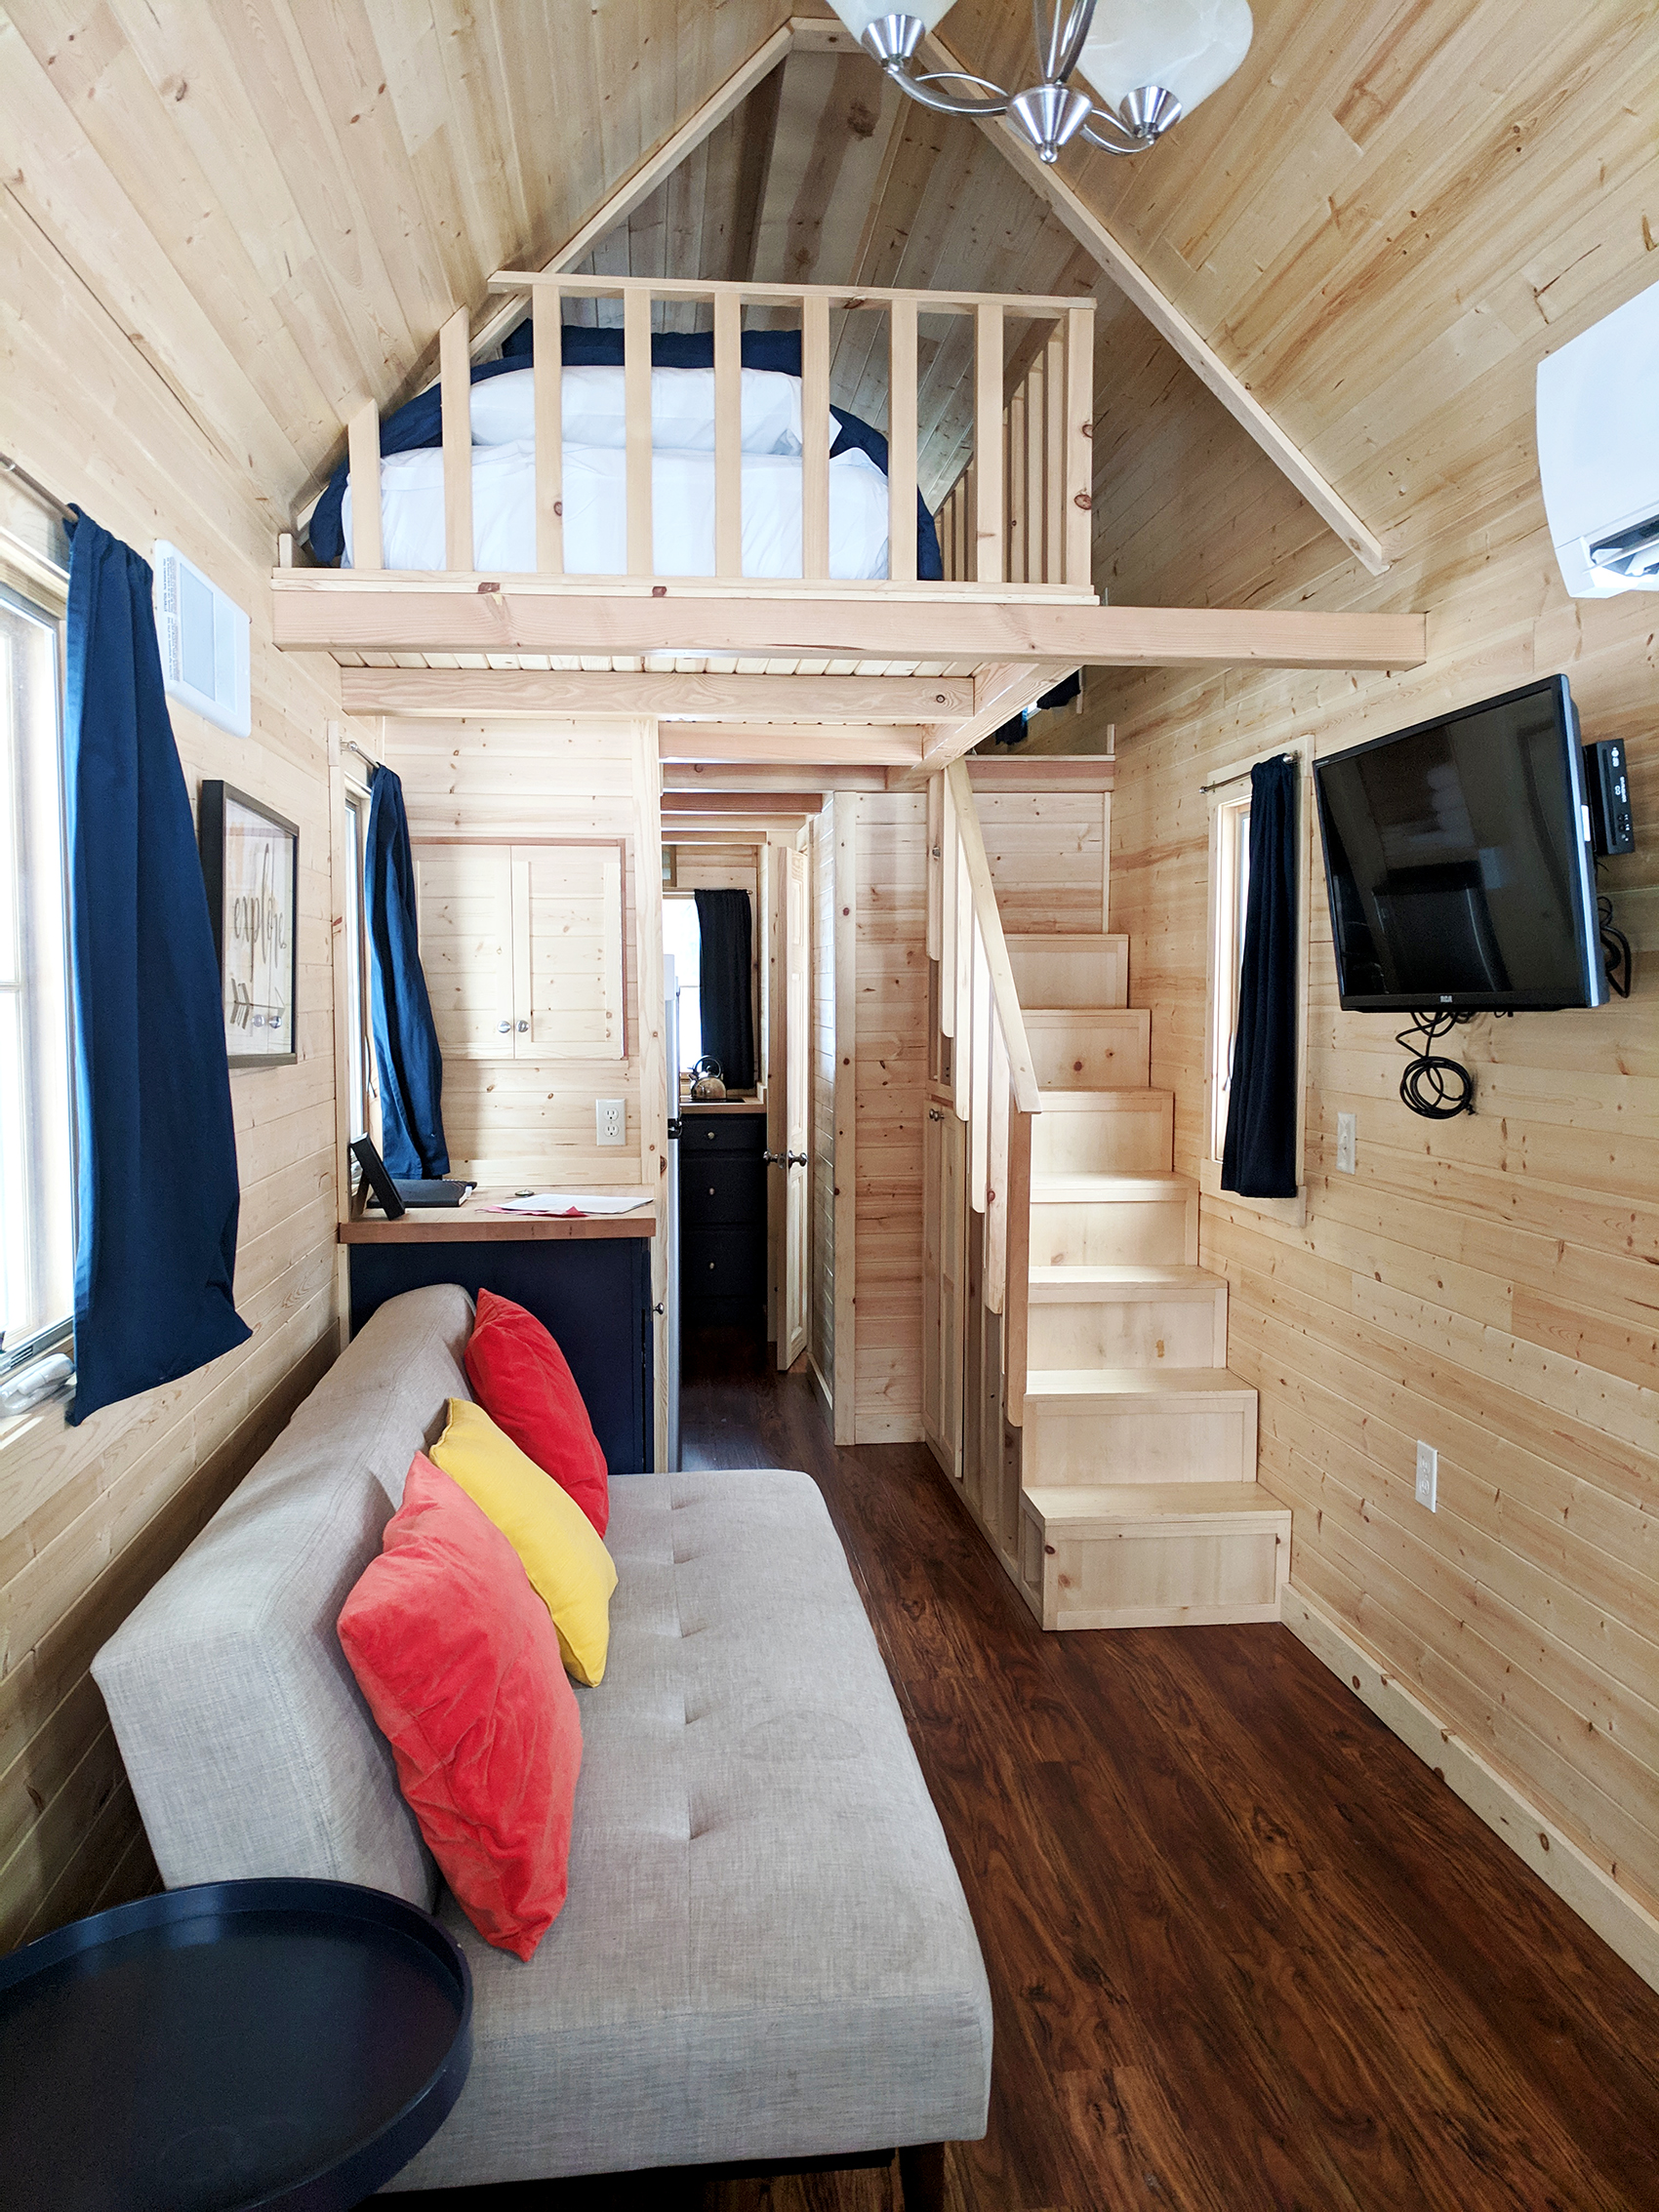 Otto tiny home interior